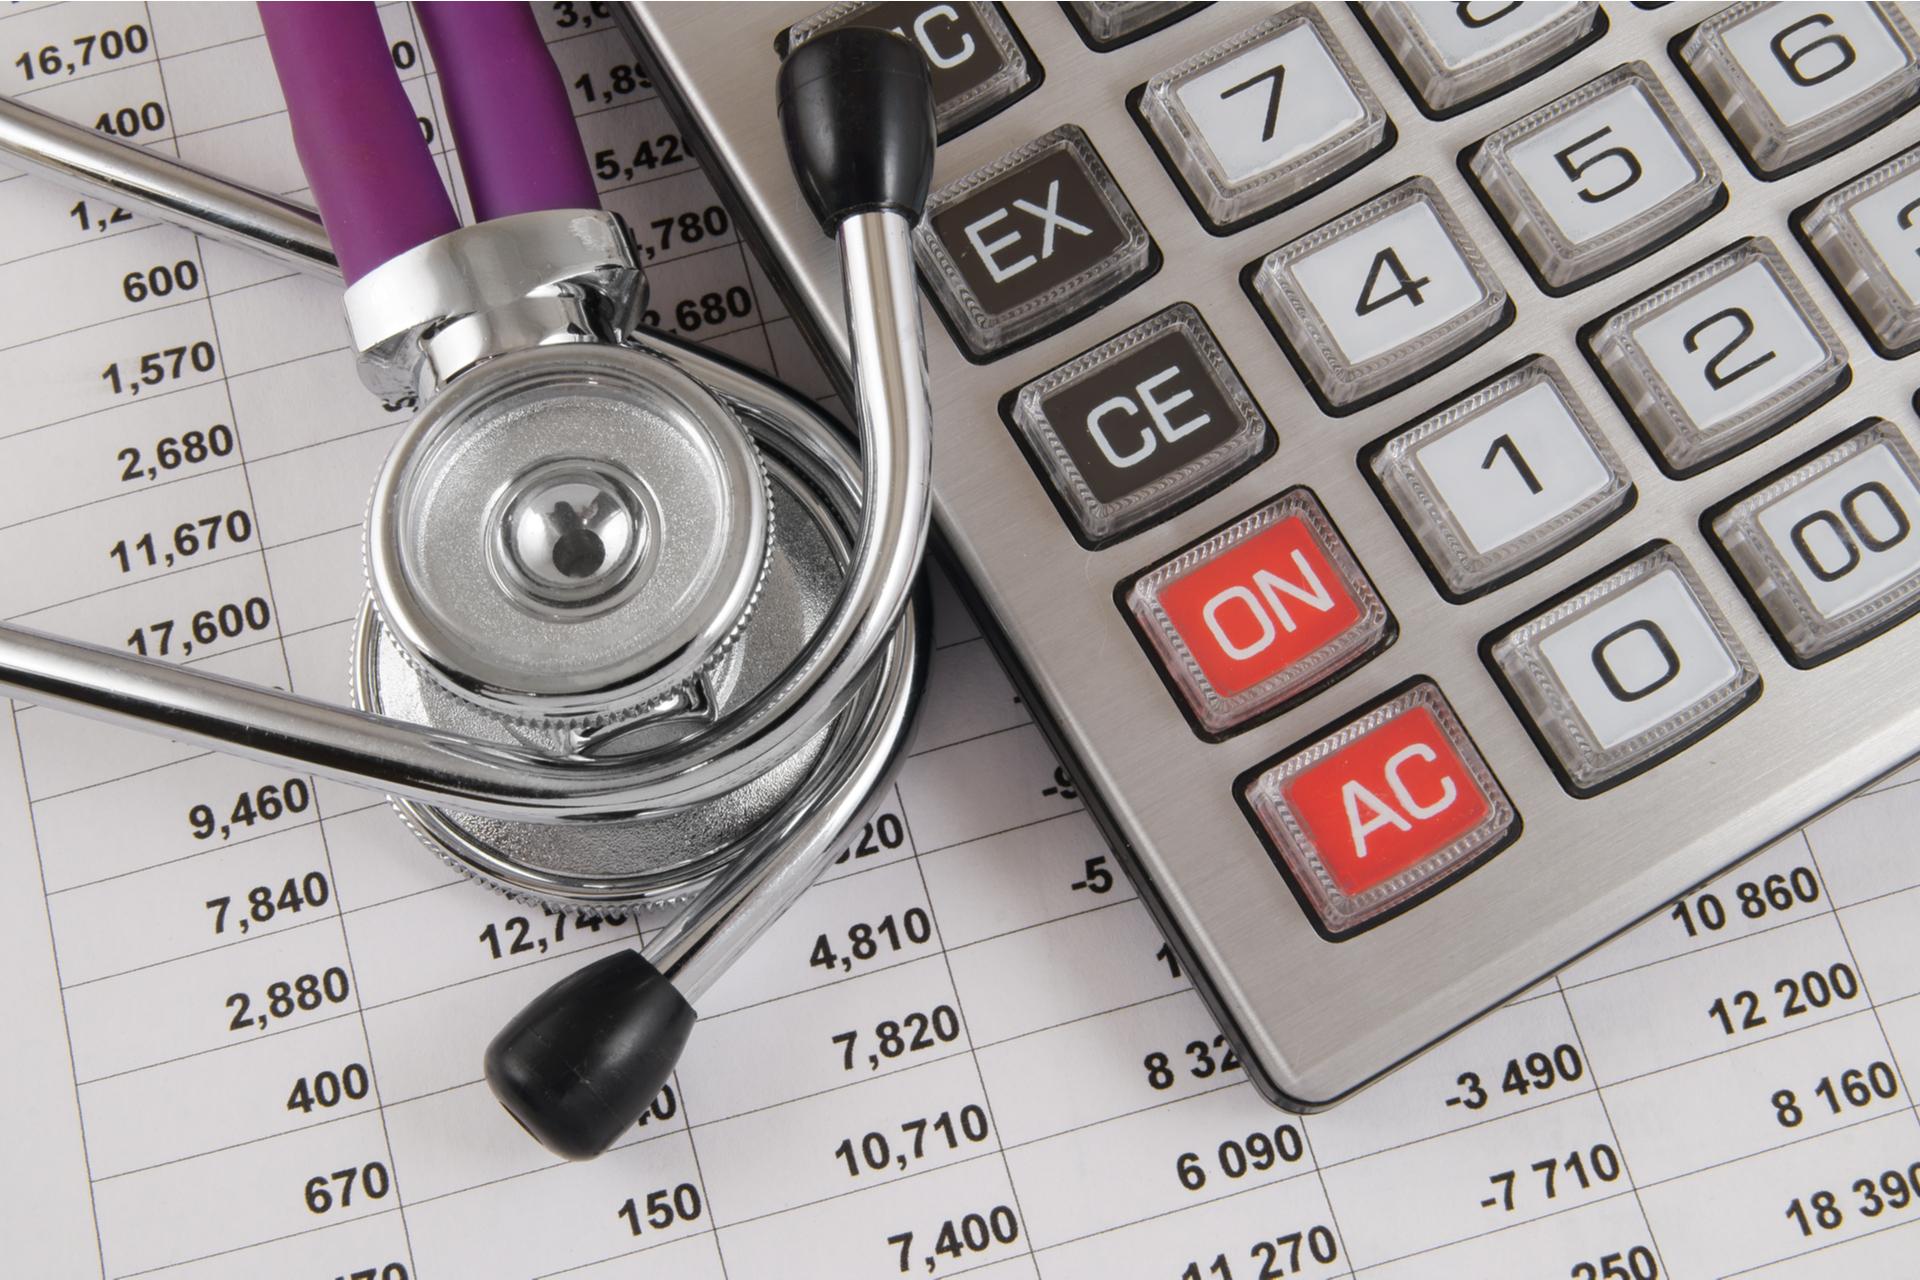 health benefit cost 2021